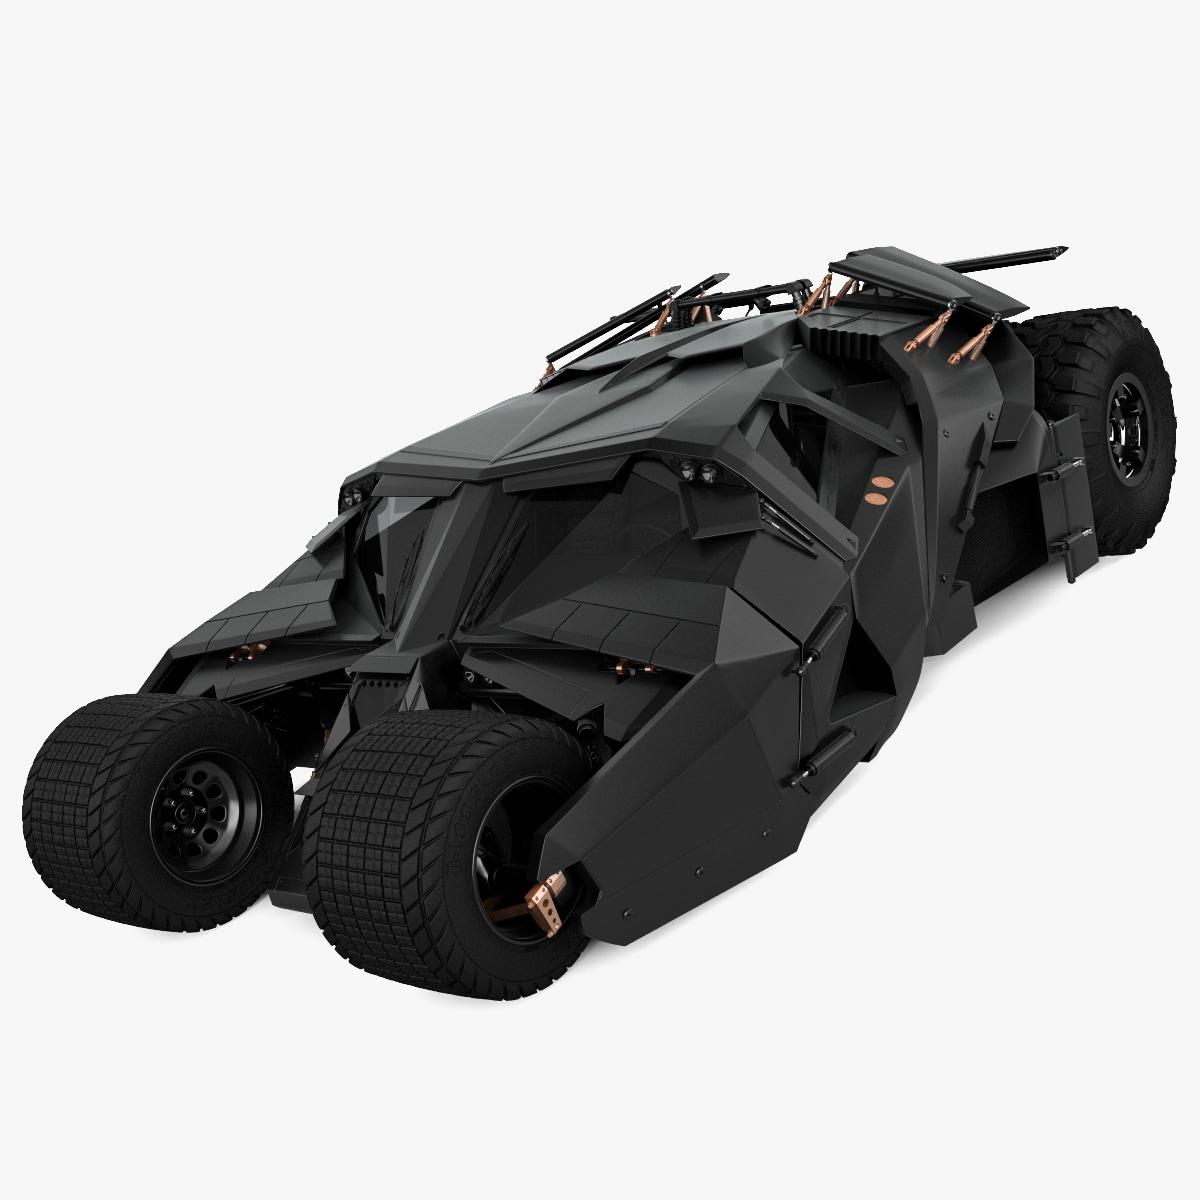 Batmobile_Tumbler_00.jpg